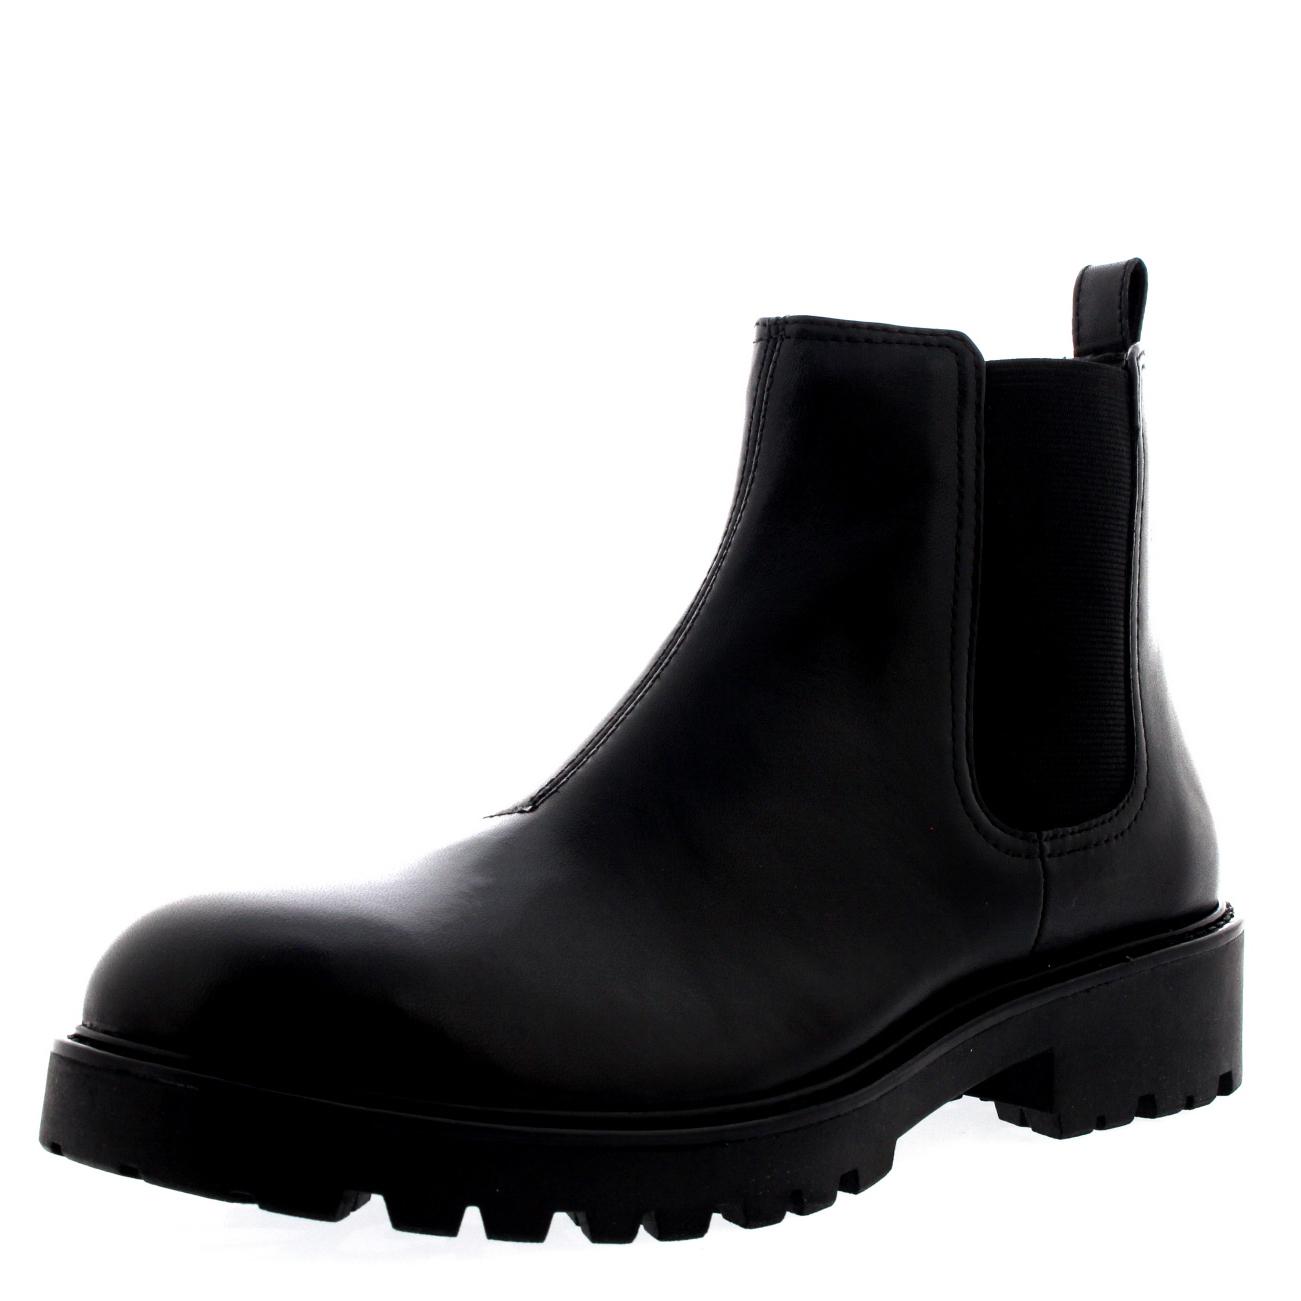 ladies vagabond kenova black elasitc low heel winter. Black Bedroom Furniture Sets. Home Design Ideas